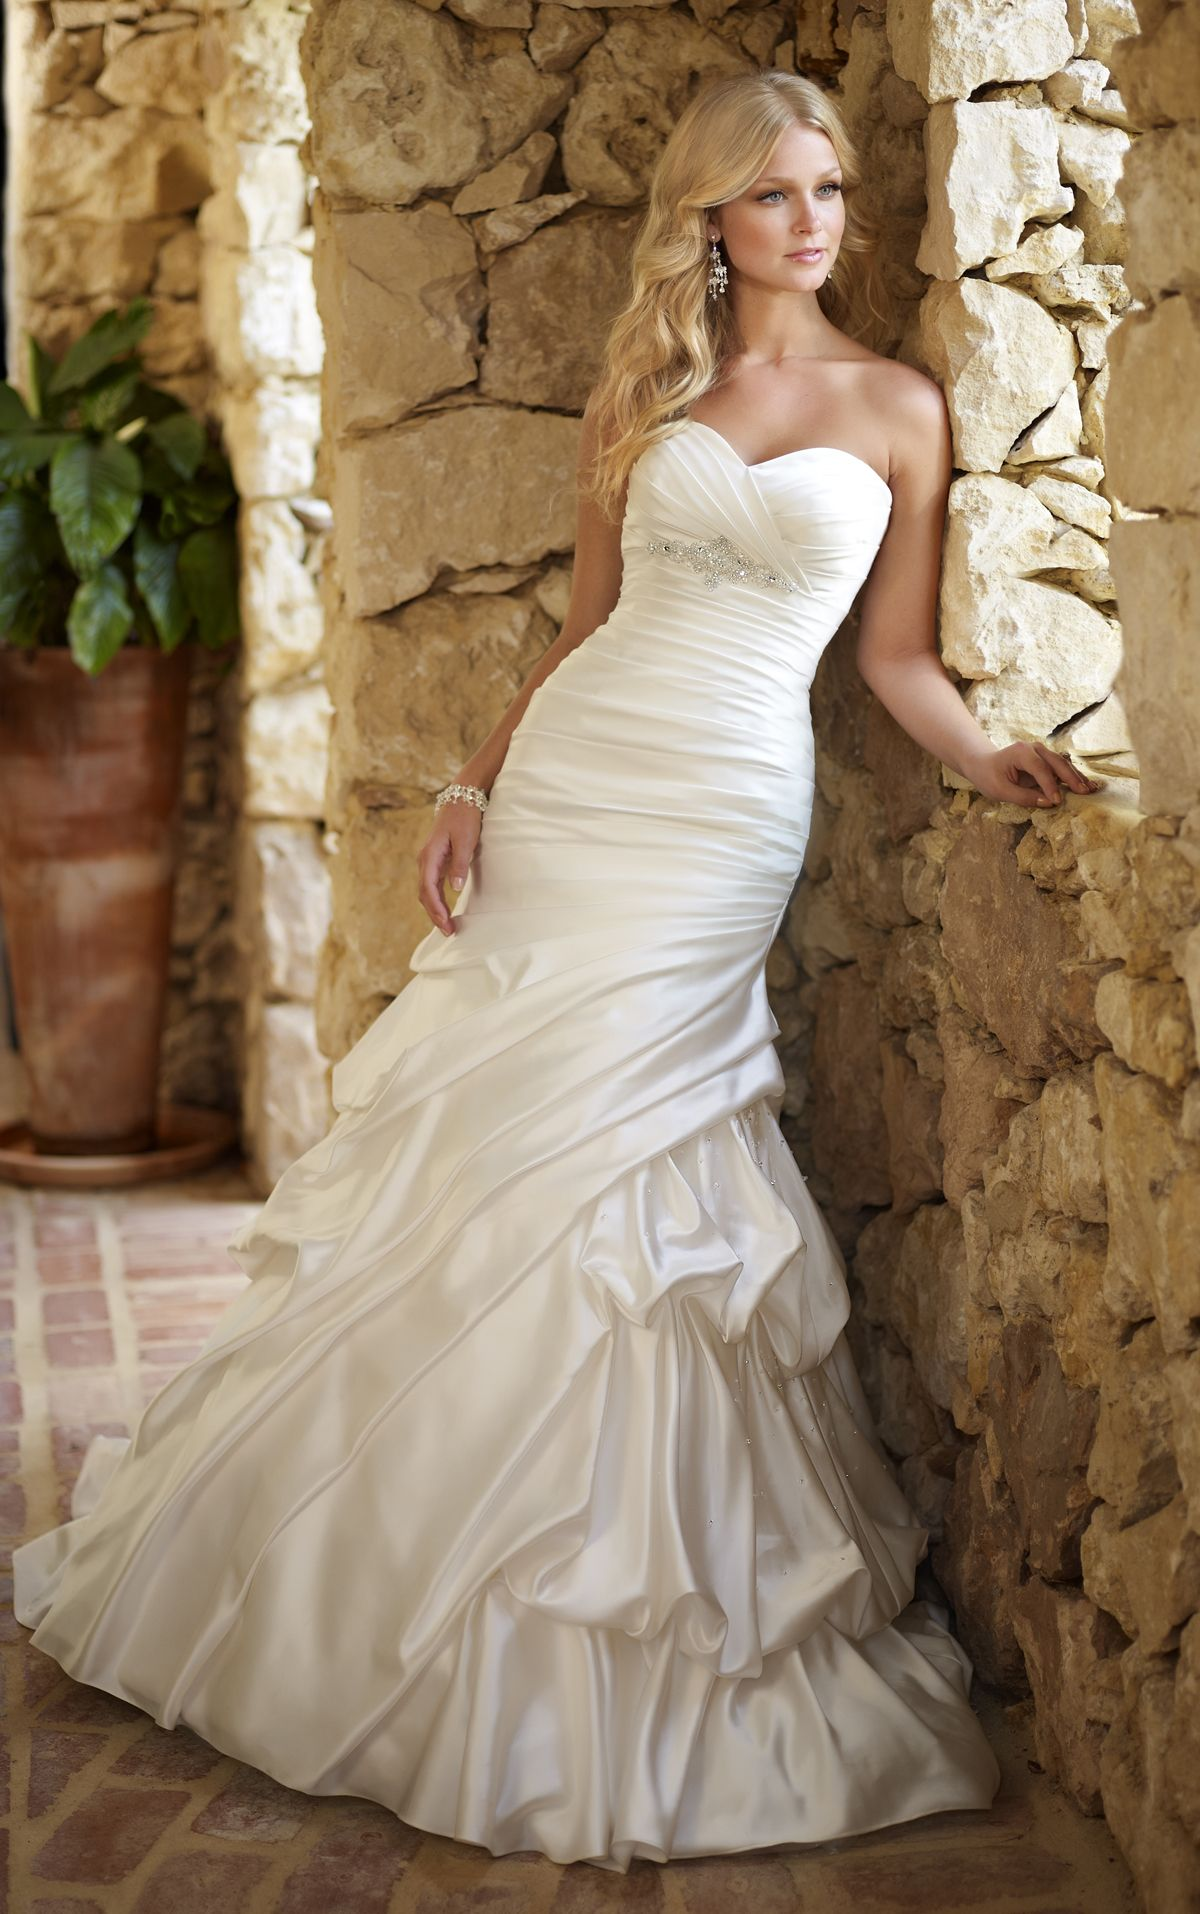 Mermaid dress wedding  Wedding Dress Gallery  Stella York  Pretty Dresses  Pinterest